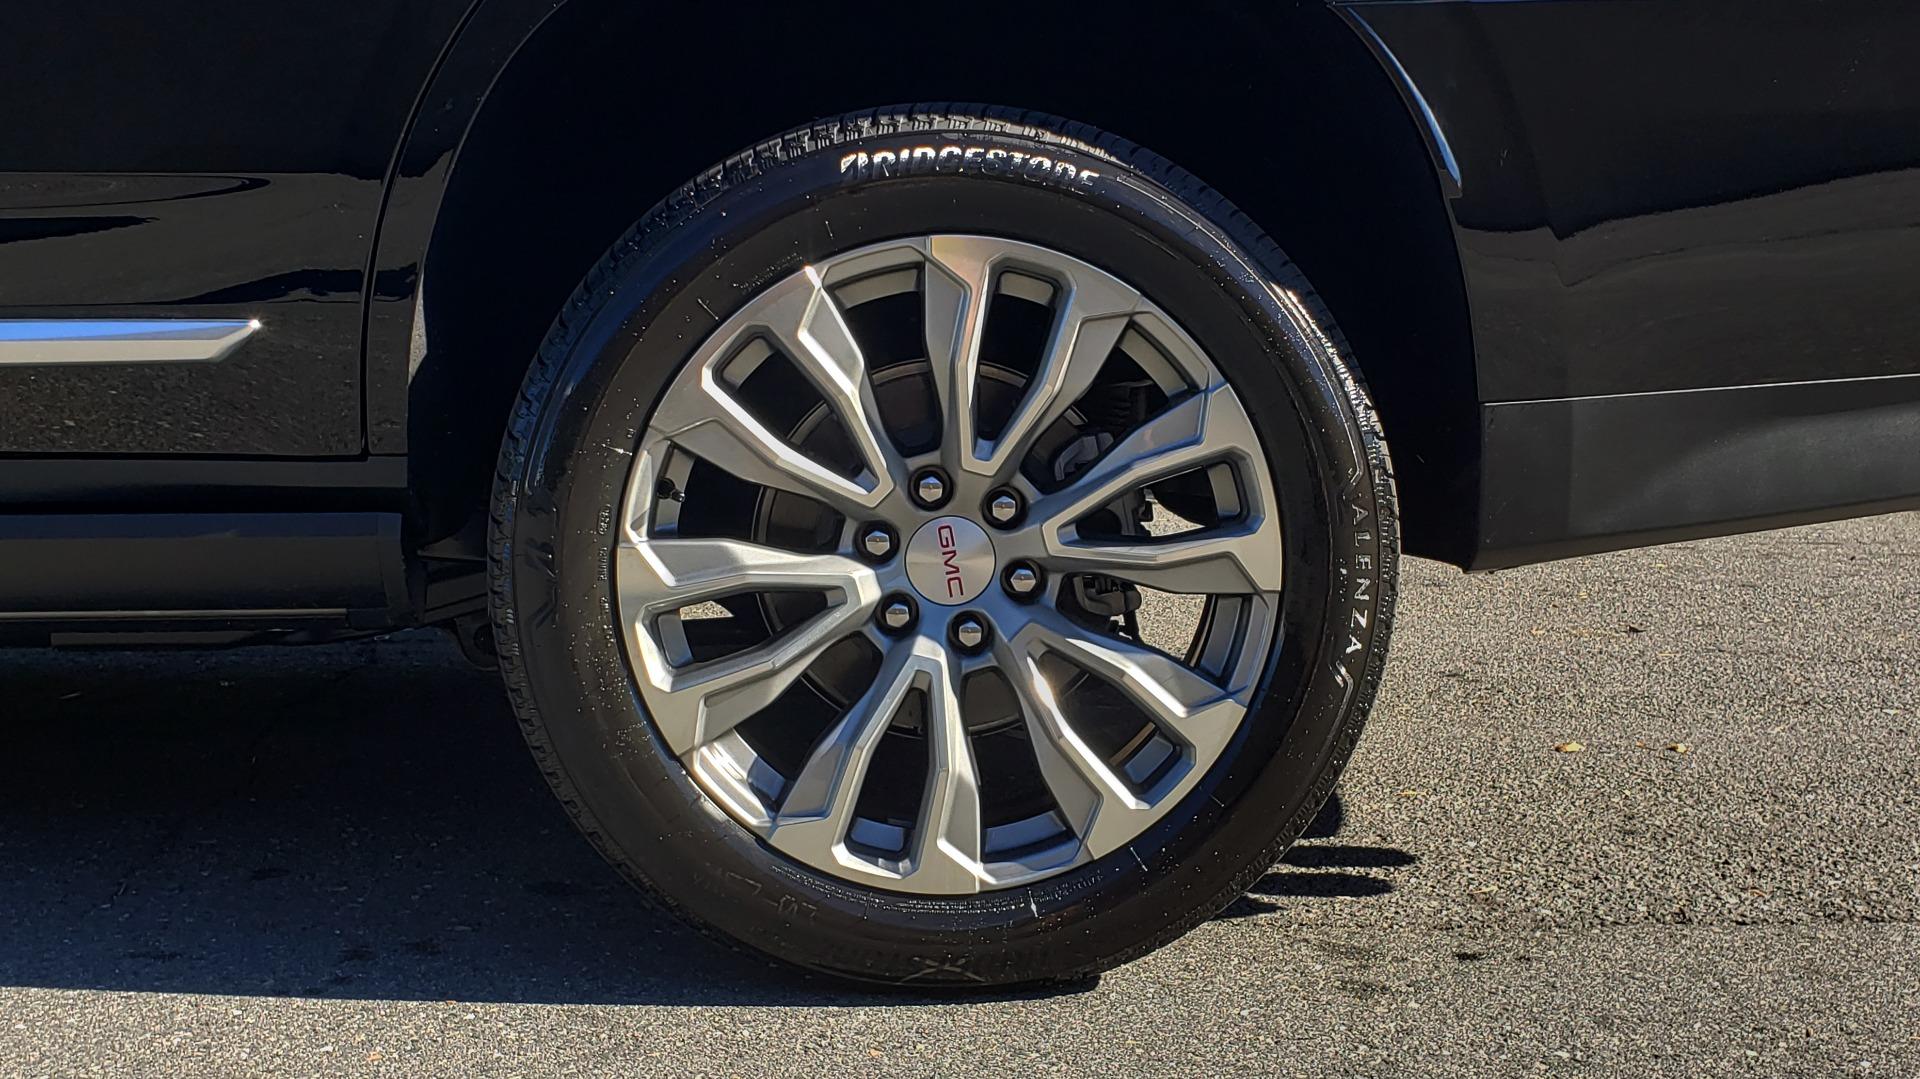 Used 2021 GMC YUKON DENALI PREMIUM 4WD / NAV / ADVANCED TECH / ENTERTAINMENT for sale Sold at Formula Imports in Charlotte NC 28227 113